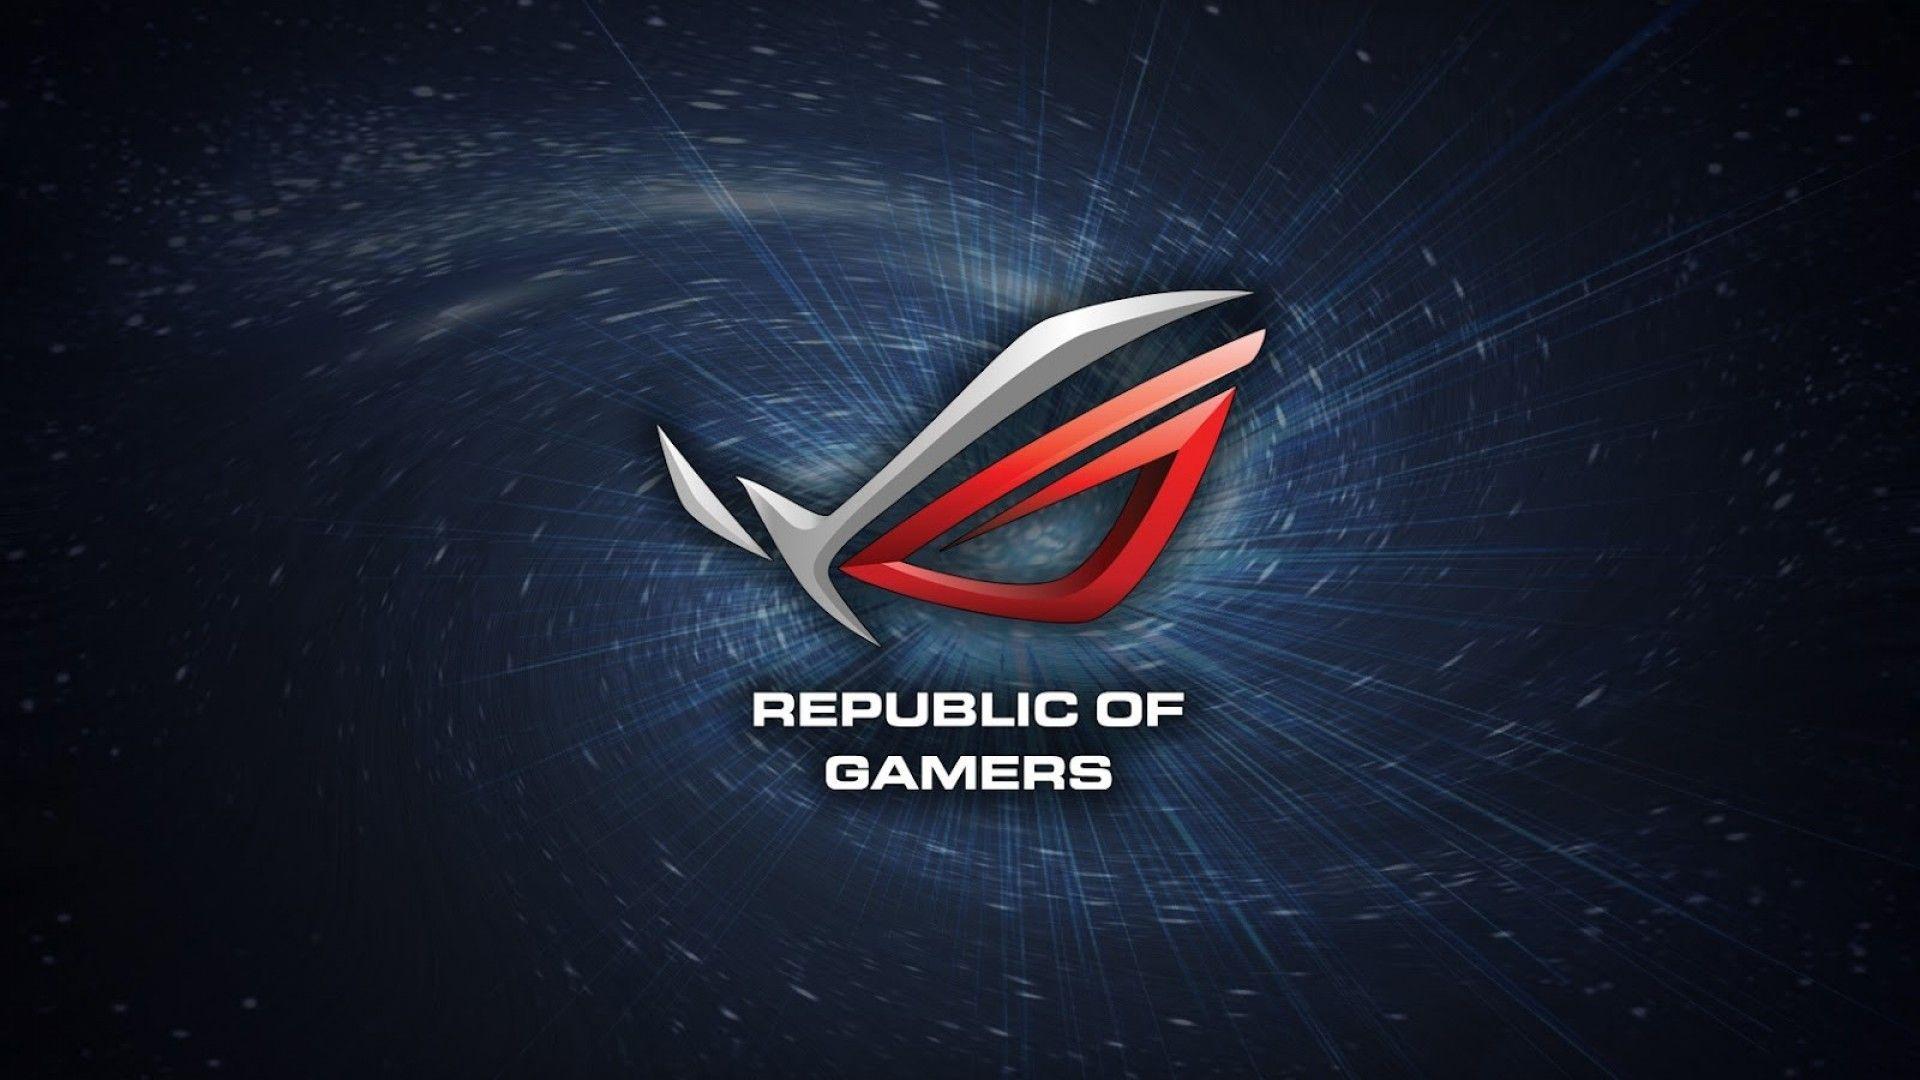 Republic Of Gamers Wallpapers Wallpaper Cave